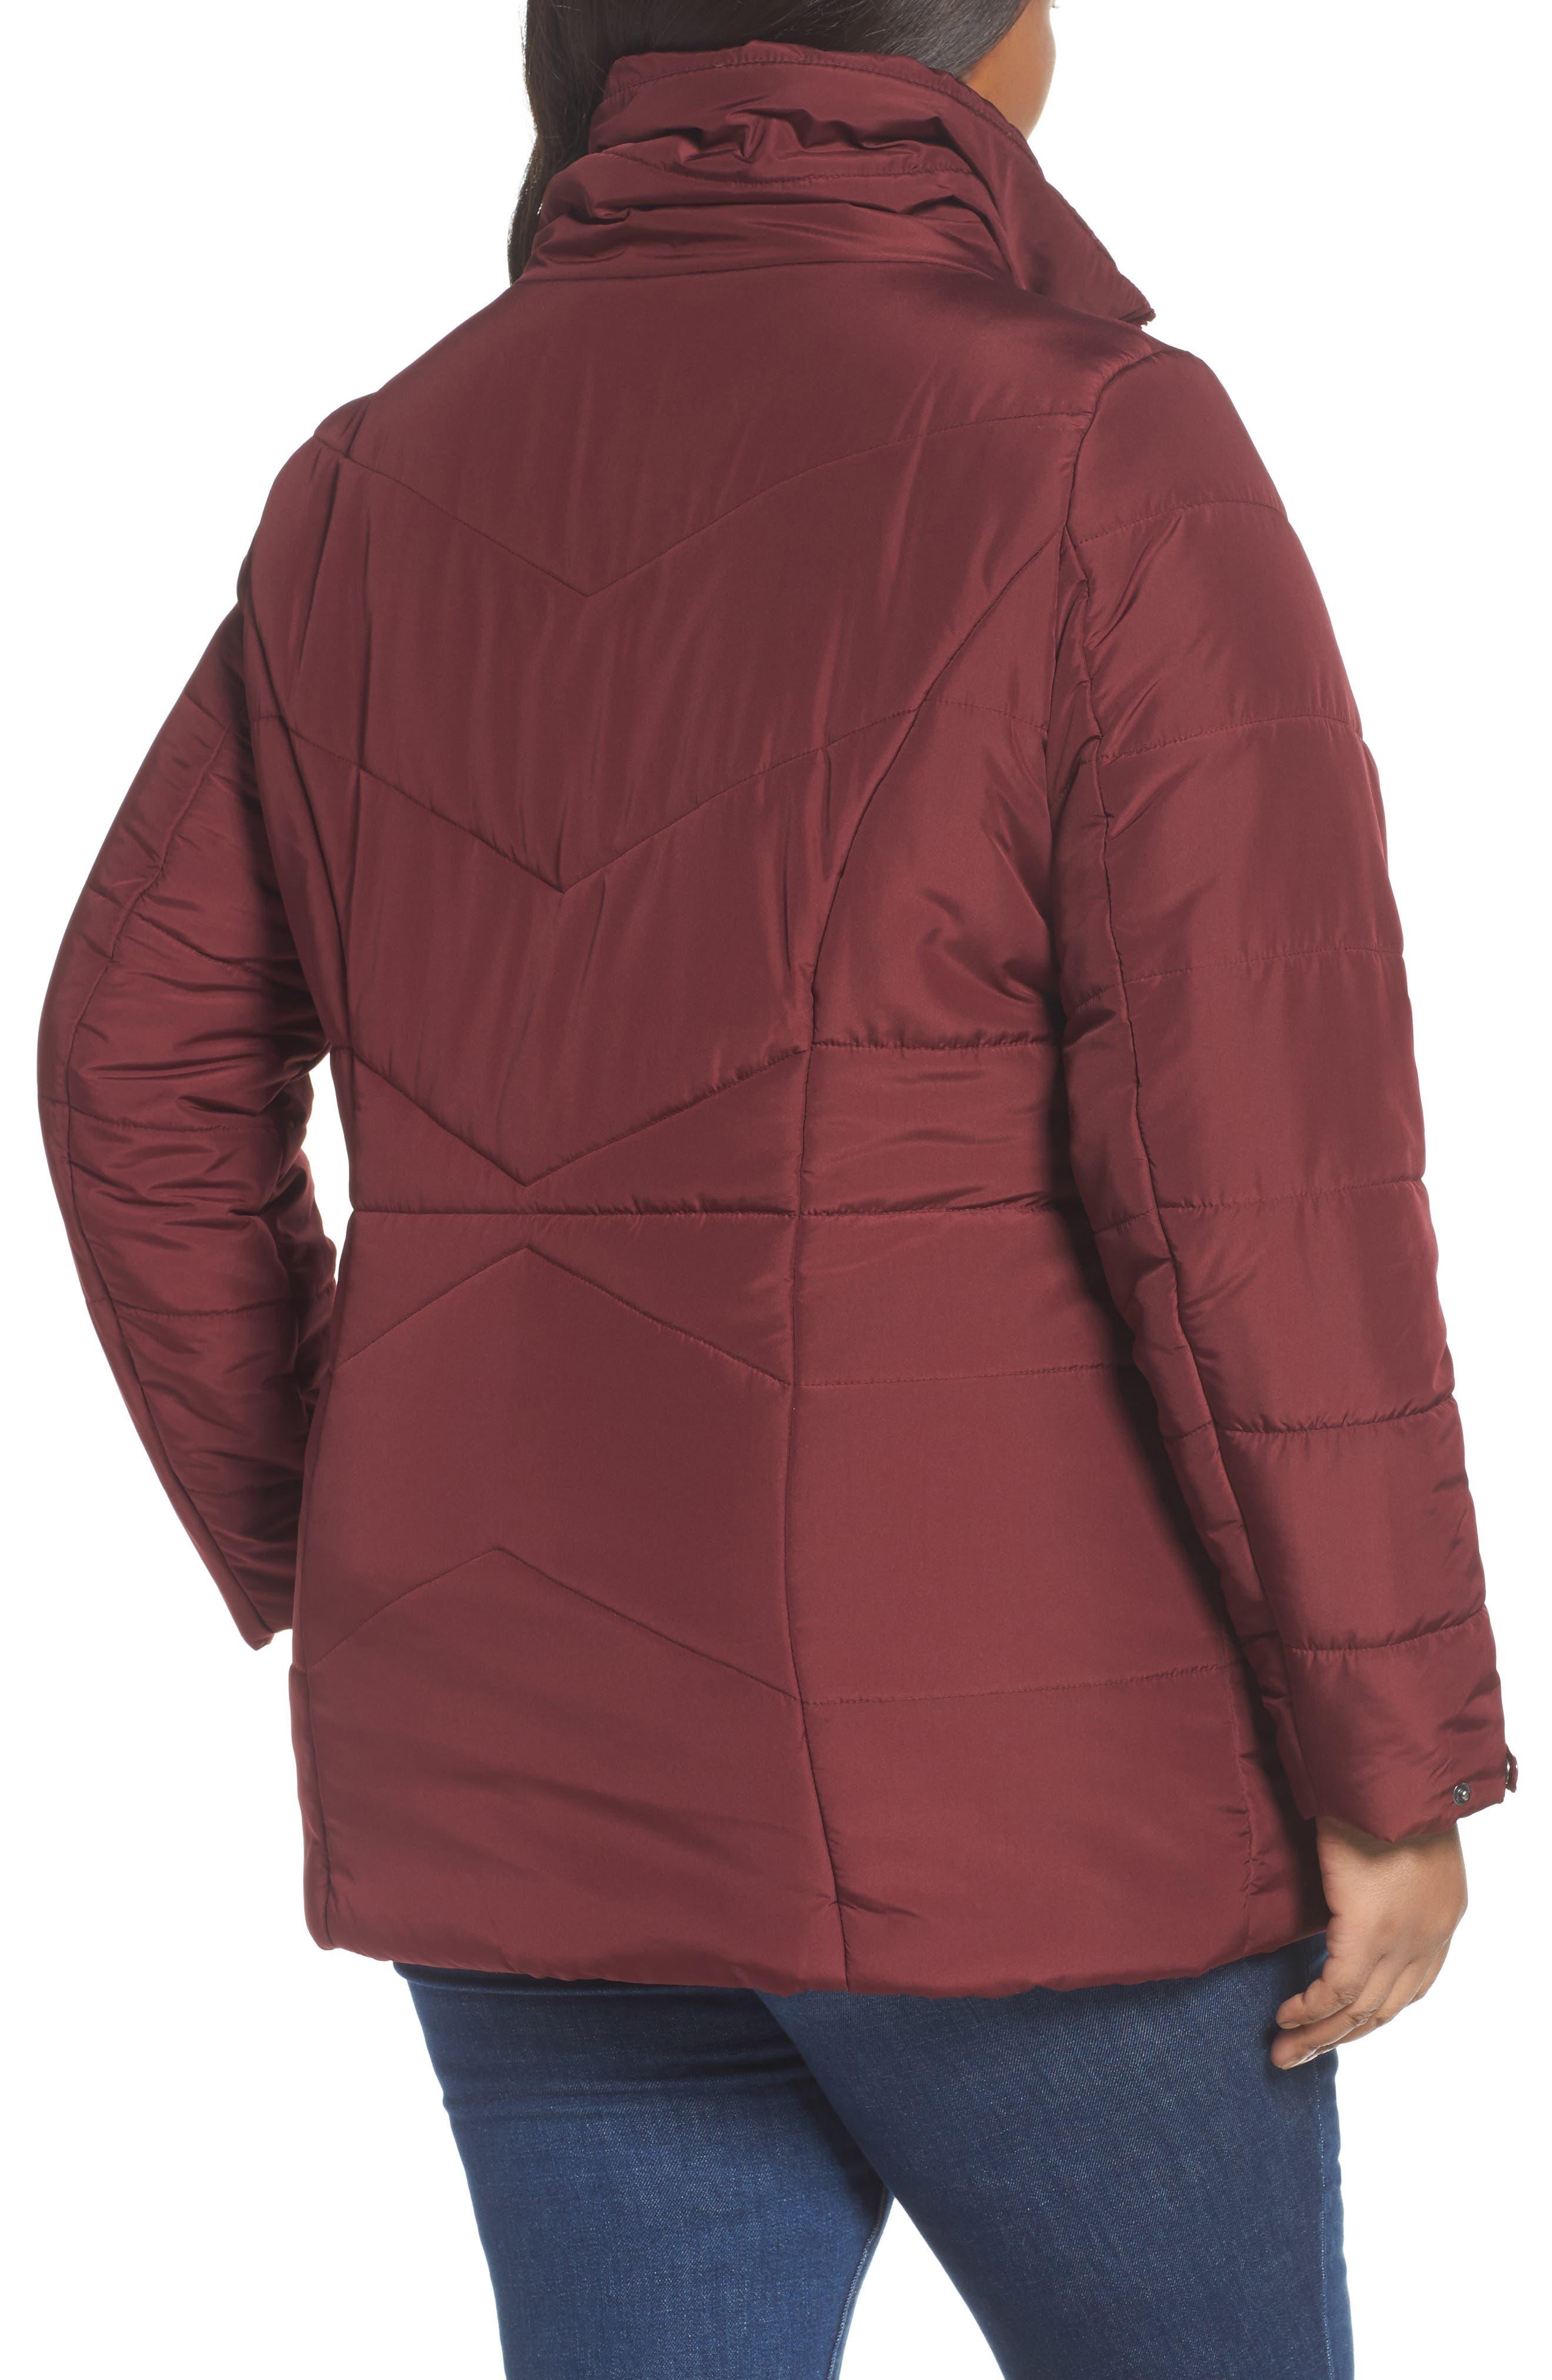 Valsi Puffer Jacket,                             Alternate thumbnail 2, color,